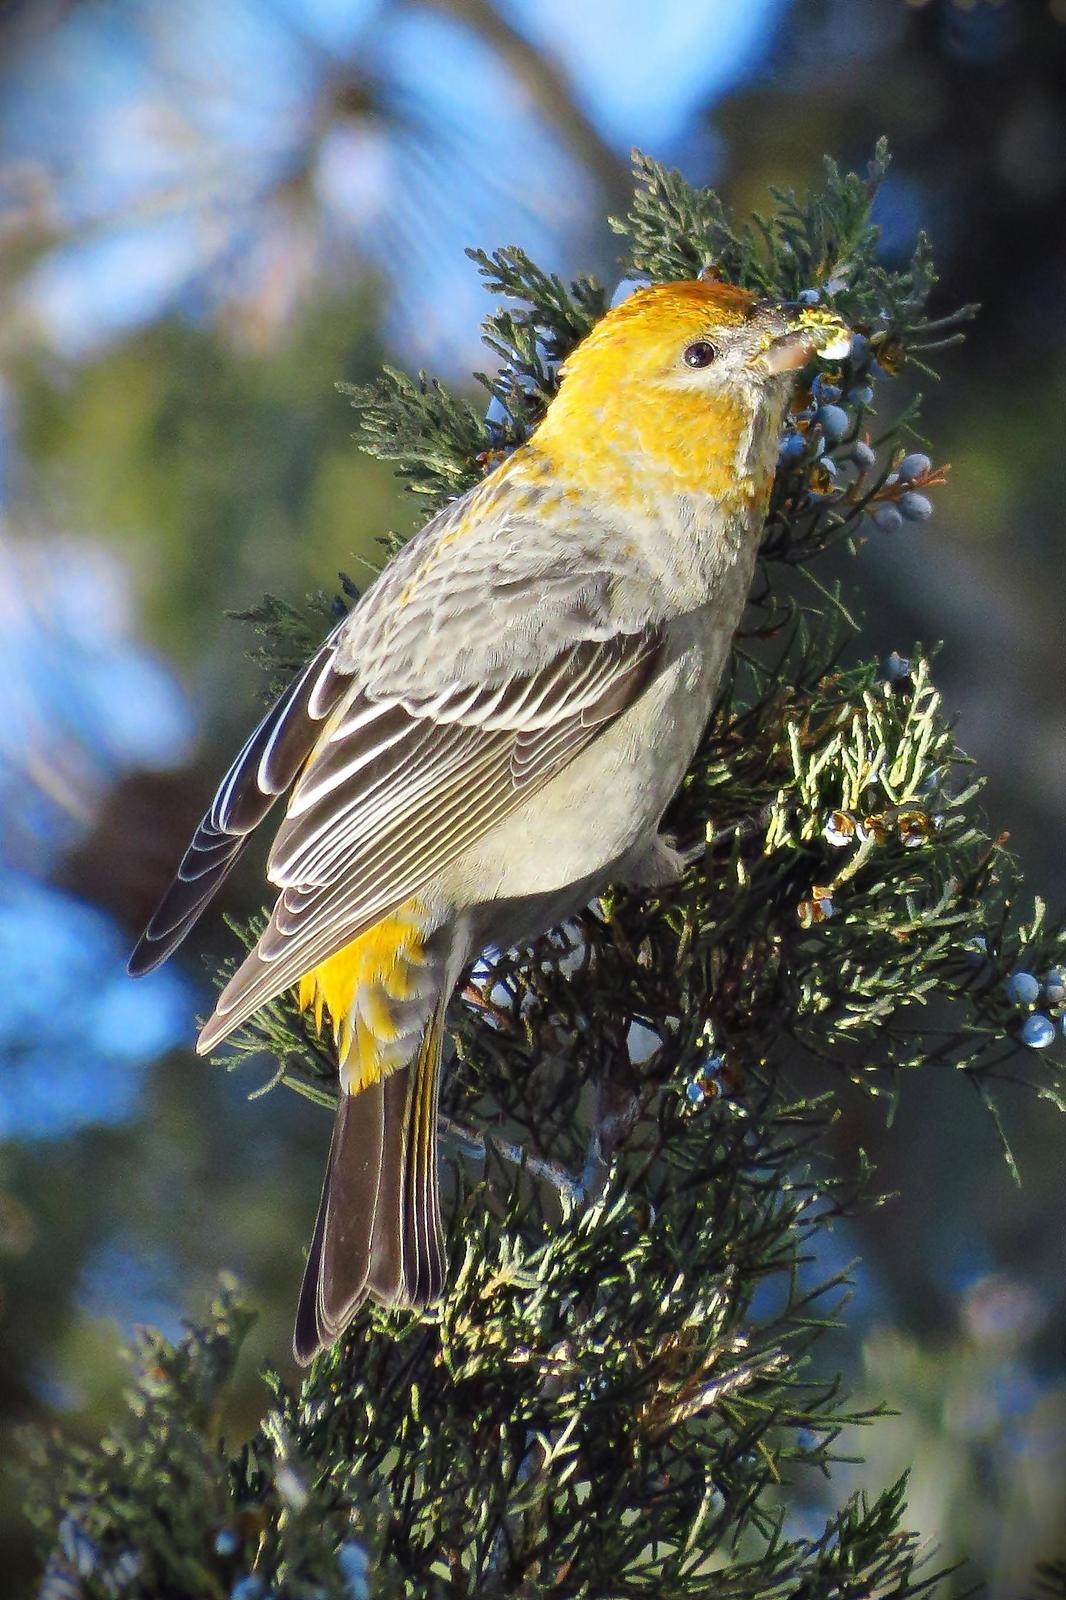 Pine Grosbeak Photo by Bob Neugebauer